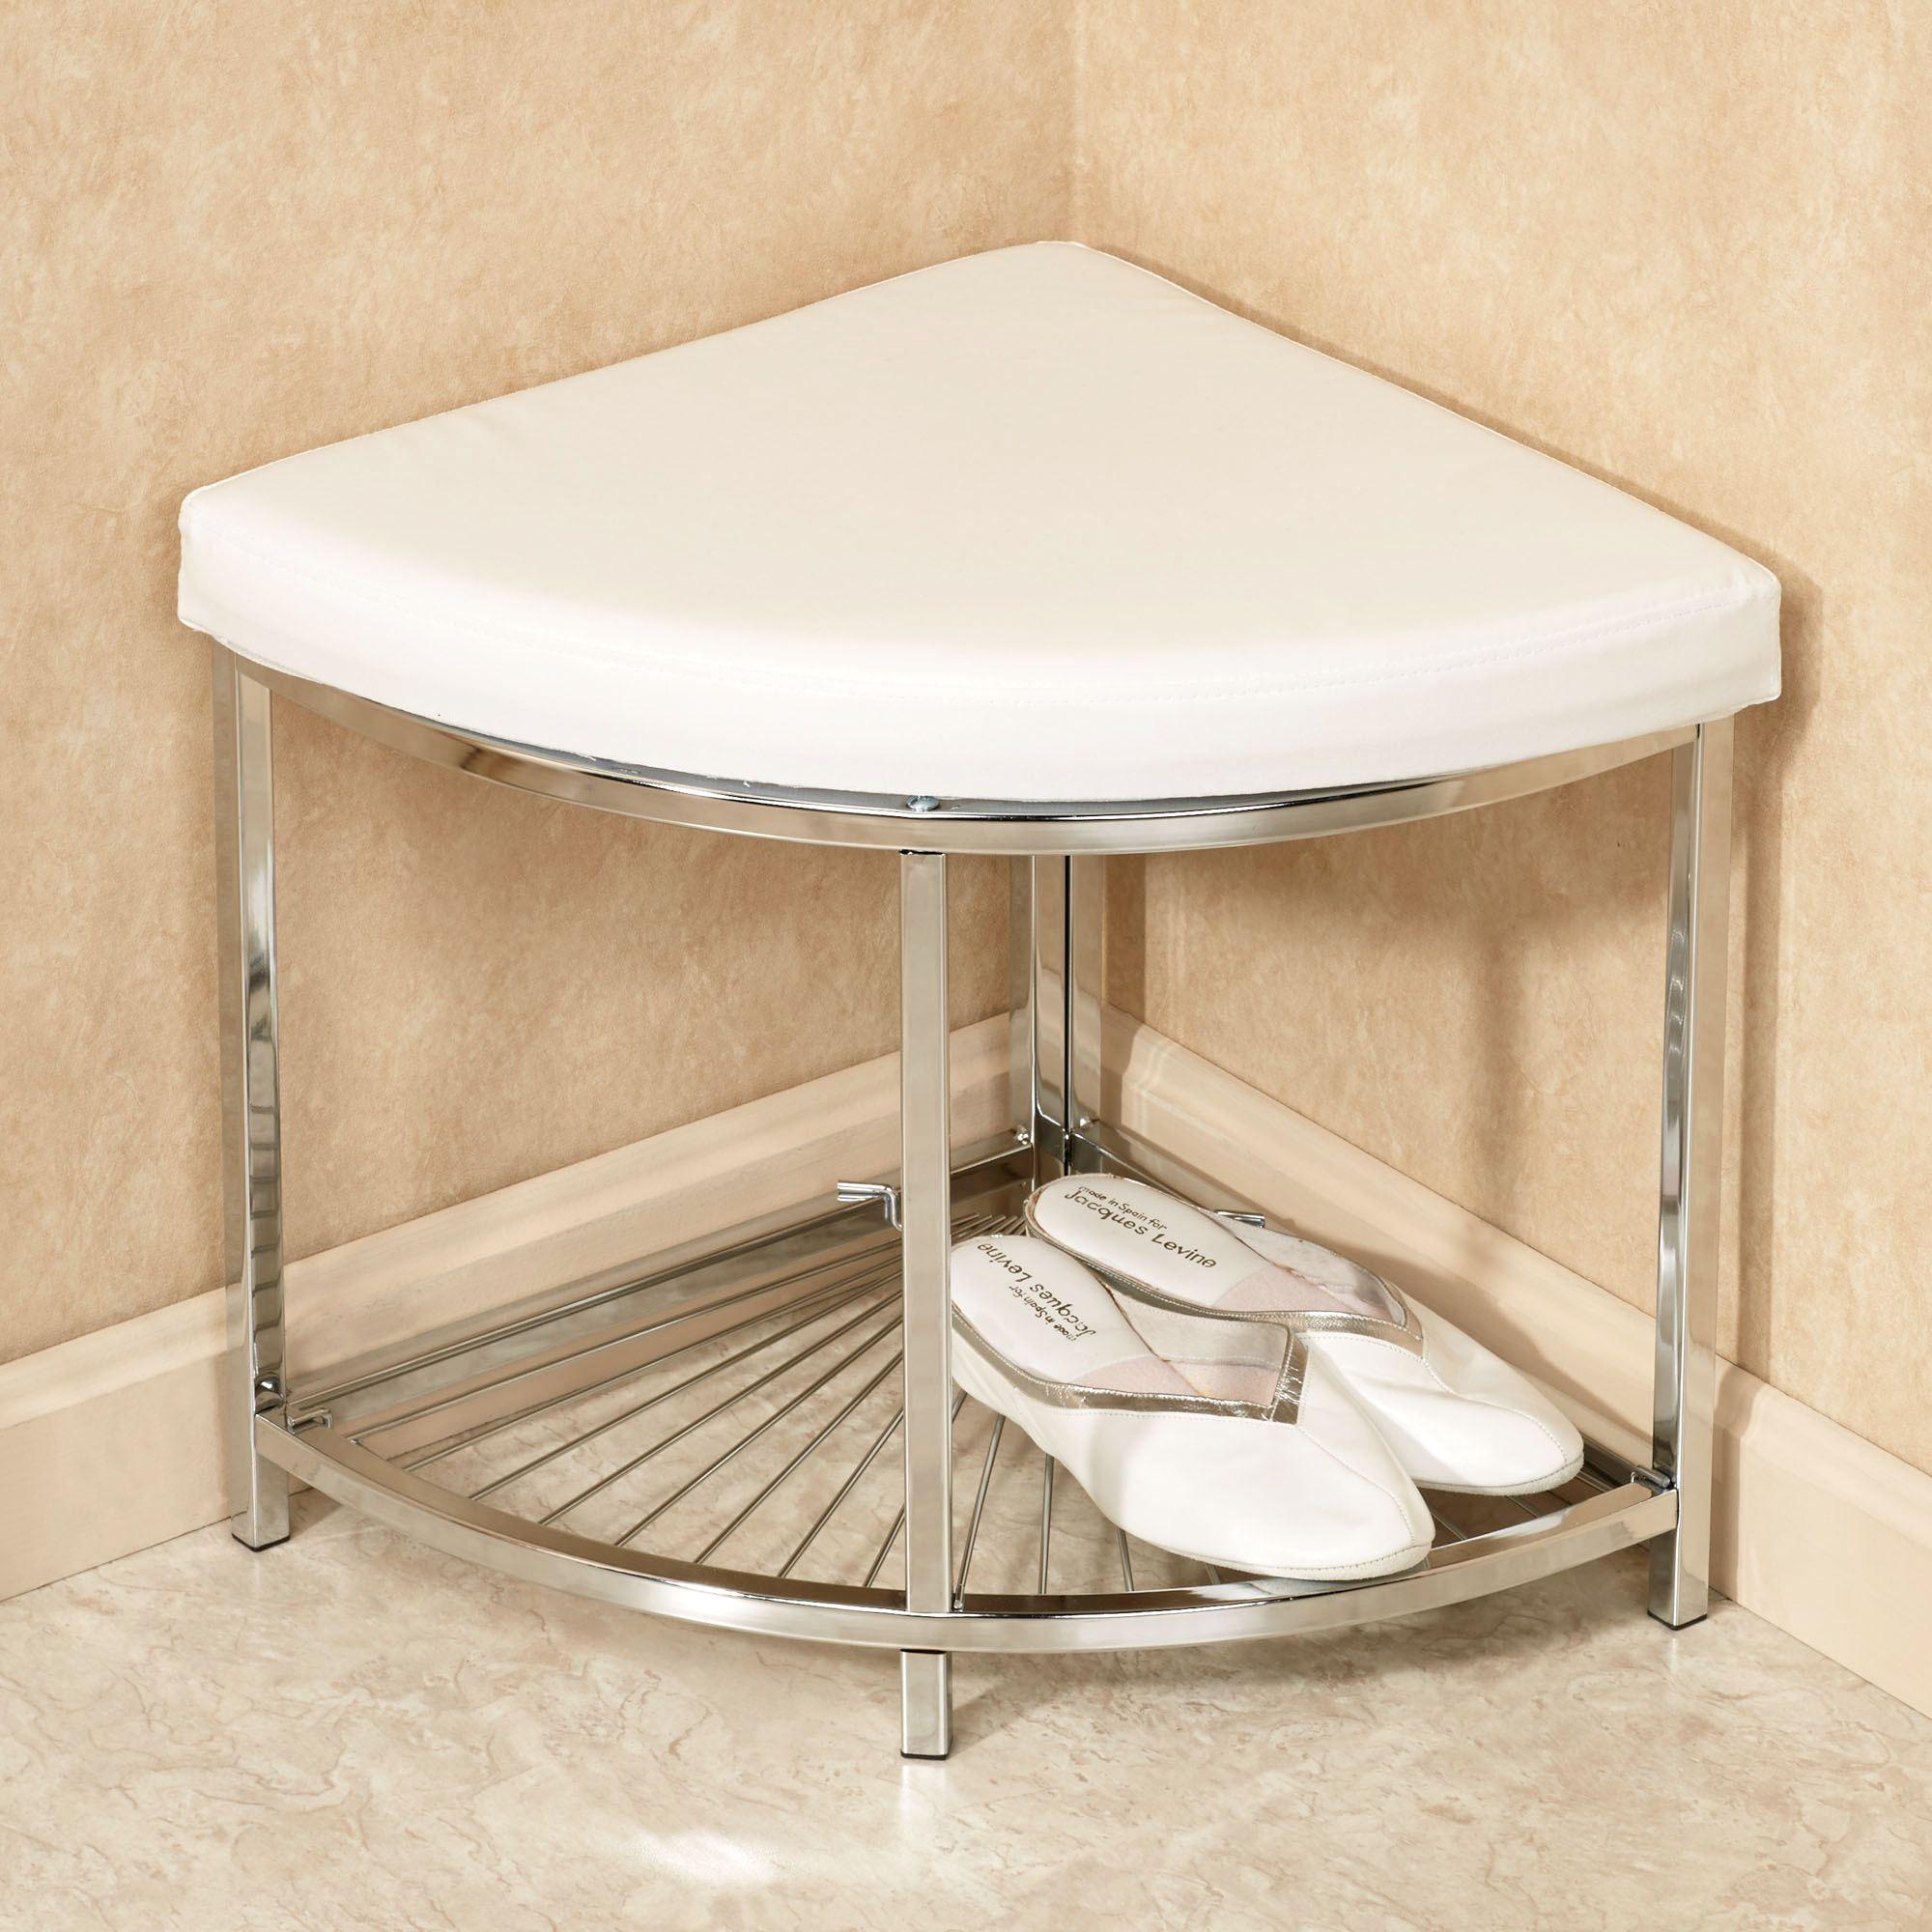 showers shower stool este corner pan seats jpeg tierra inspiration bathroom redguard great with